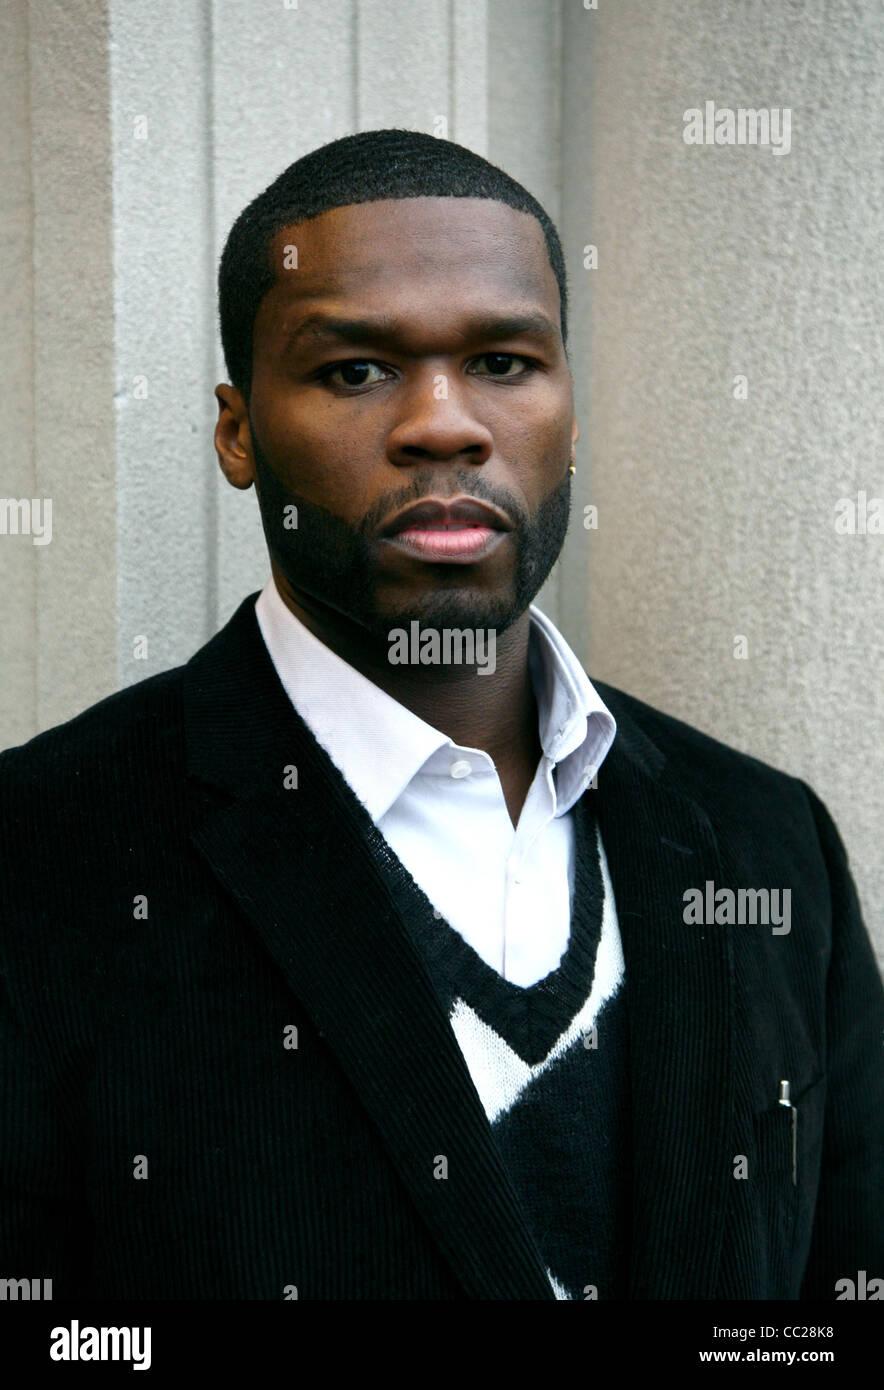 50 Cent 13 (2010) Imagen De Stock